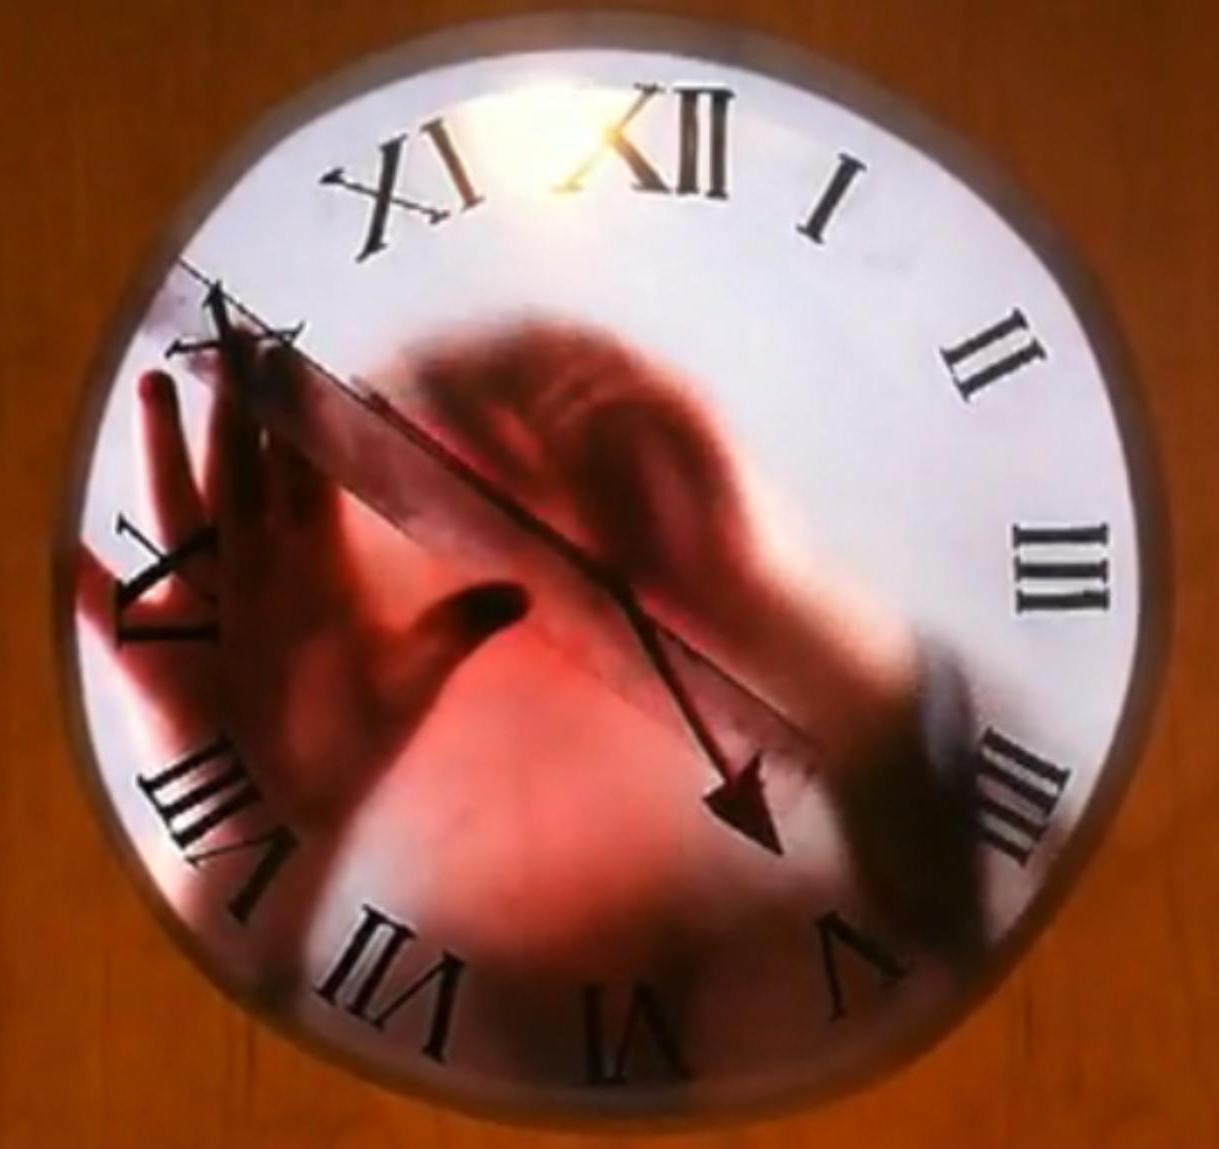 Awesome Clock In A Slightly Creepy Way Grandad